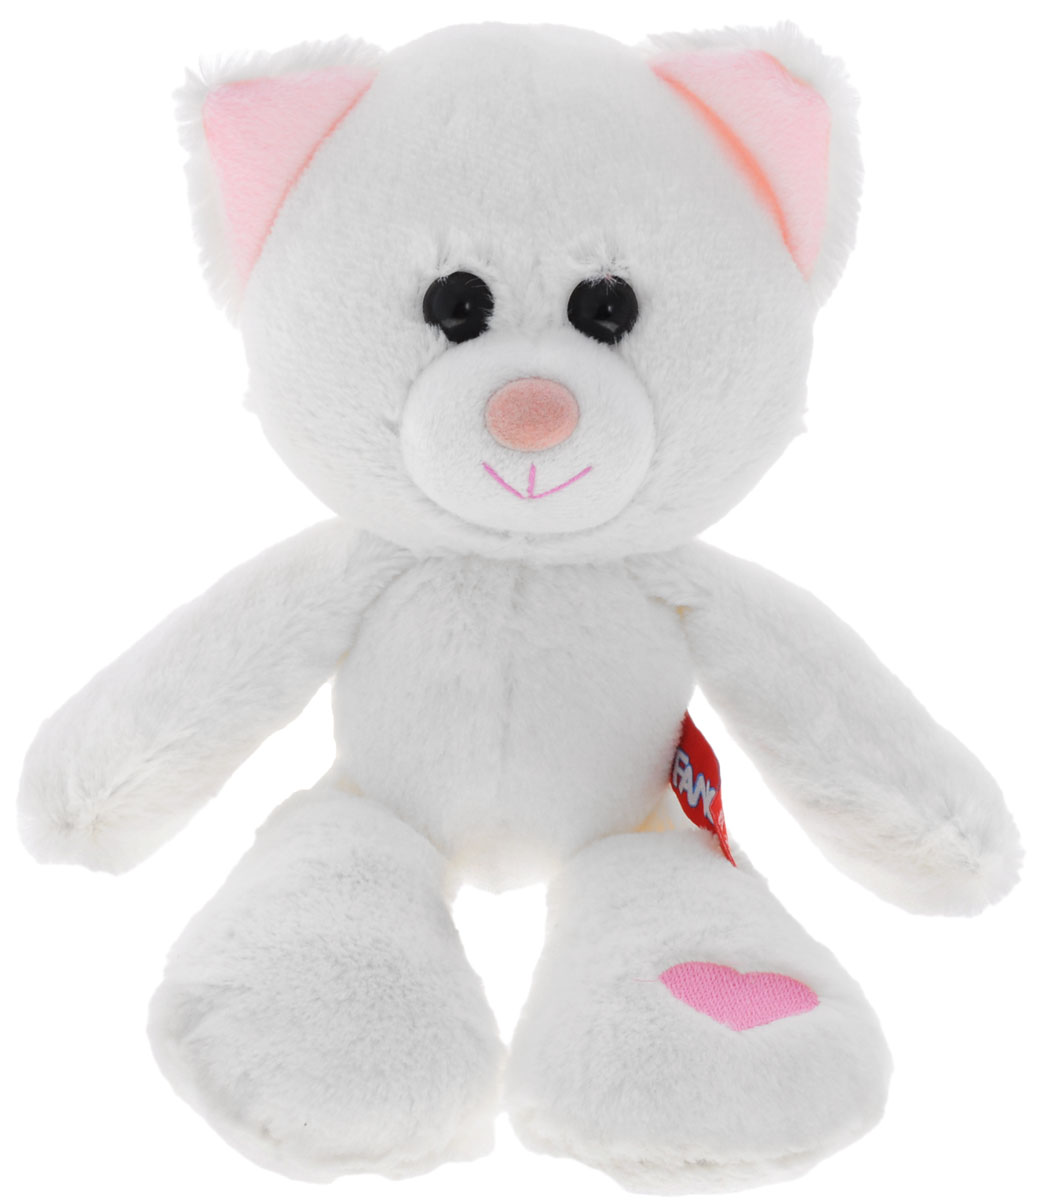 Fancy Мягкая игрушка Котенок Бася игрушка арт 1805 36 мягкая игрушка котенок трехшерстный м